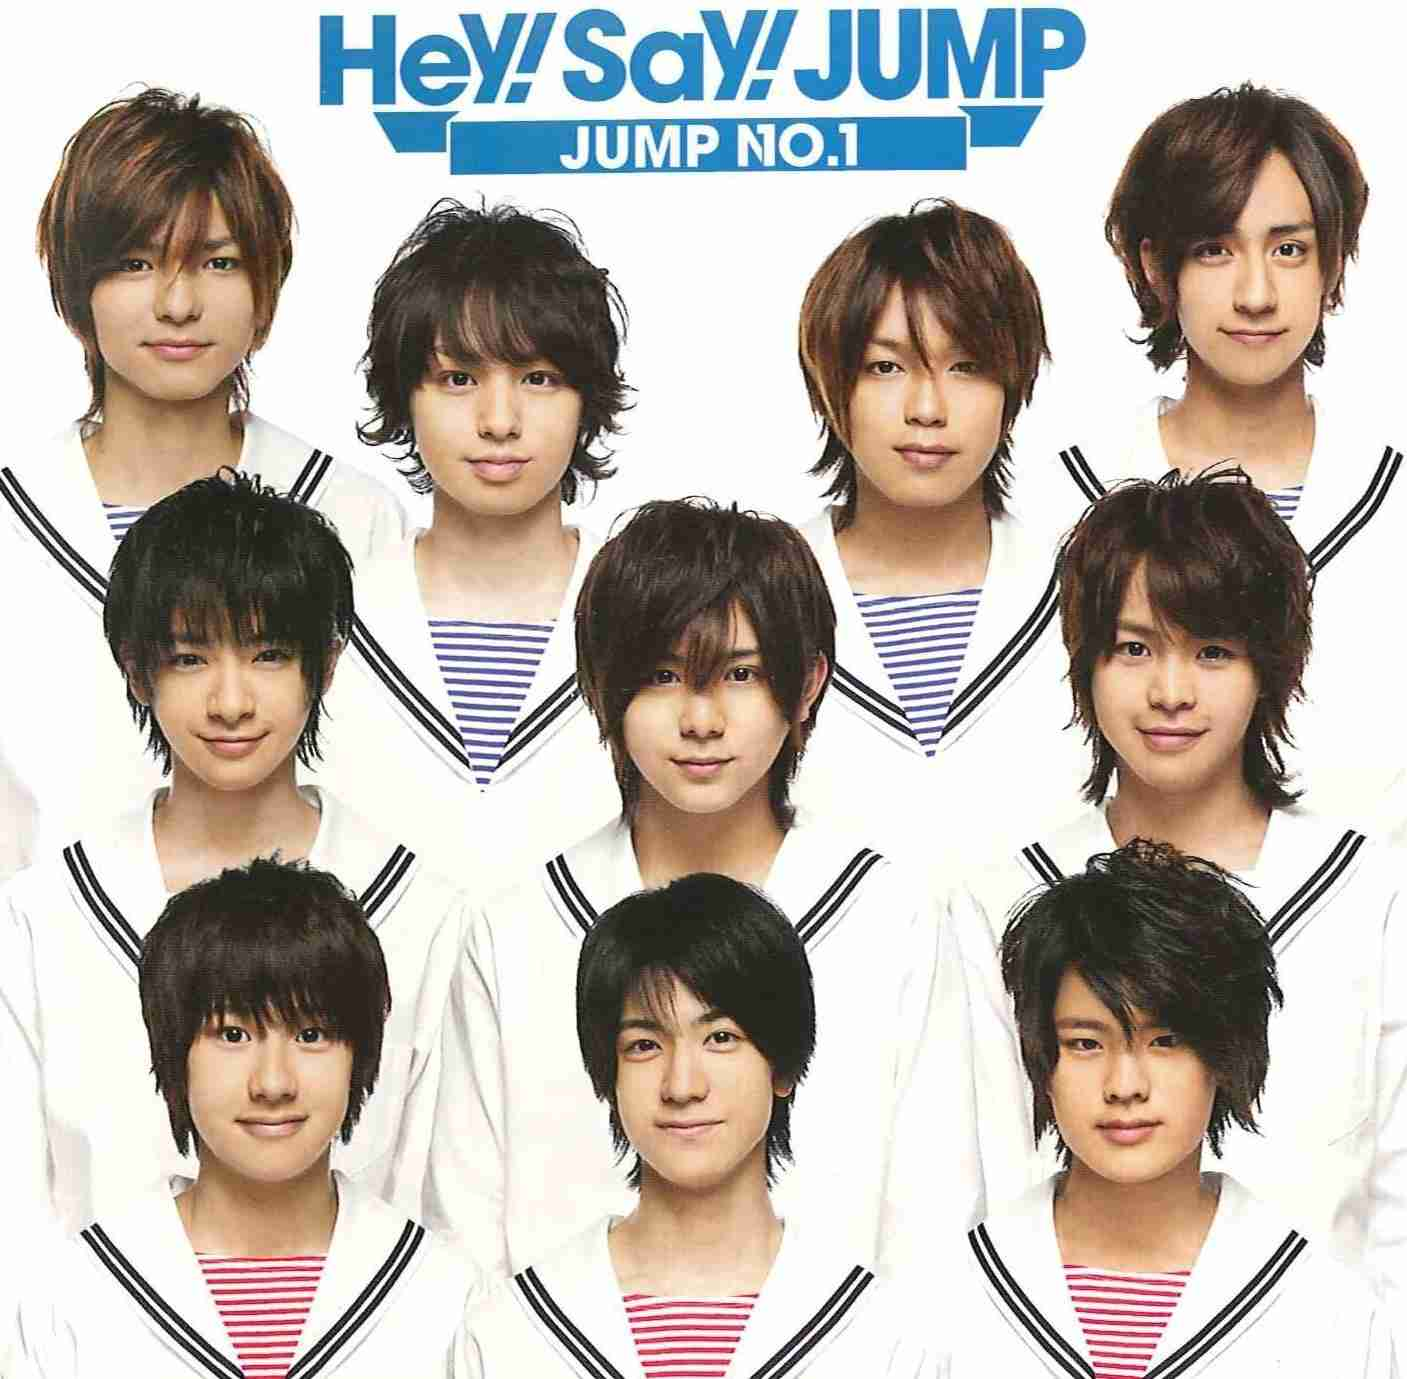 Hey!Say!JUMP人気で雑誌が完売! 出版社が「増刷を望むなら申し込みを」と異例の呼びかけ